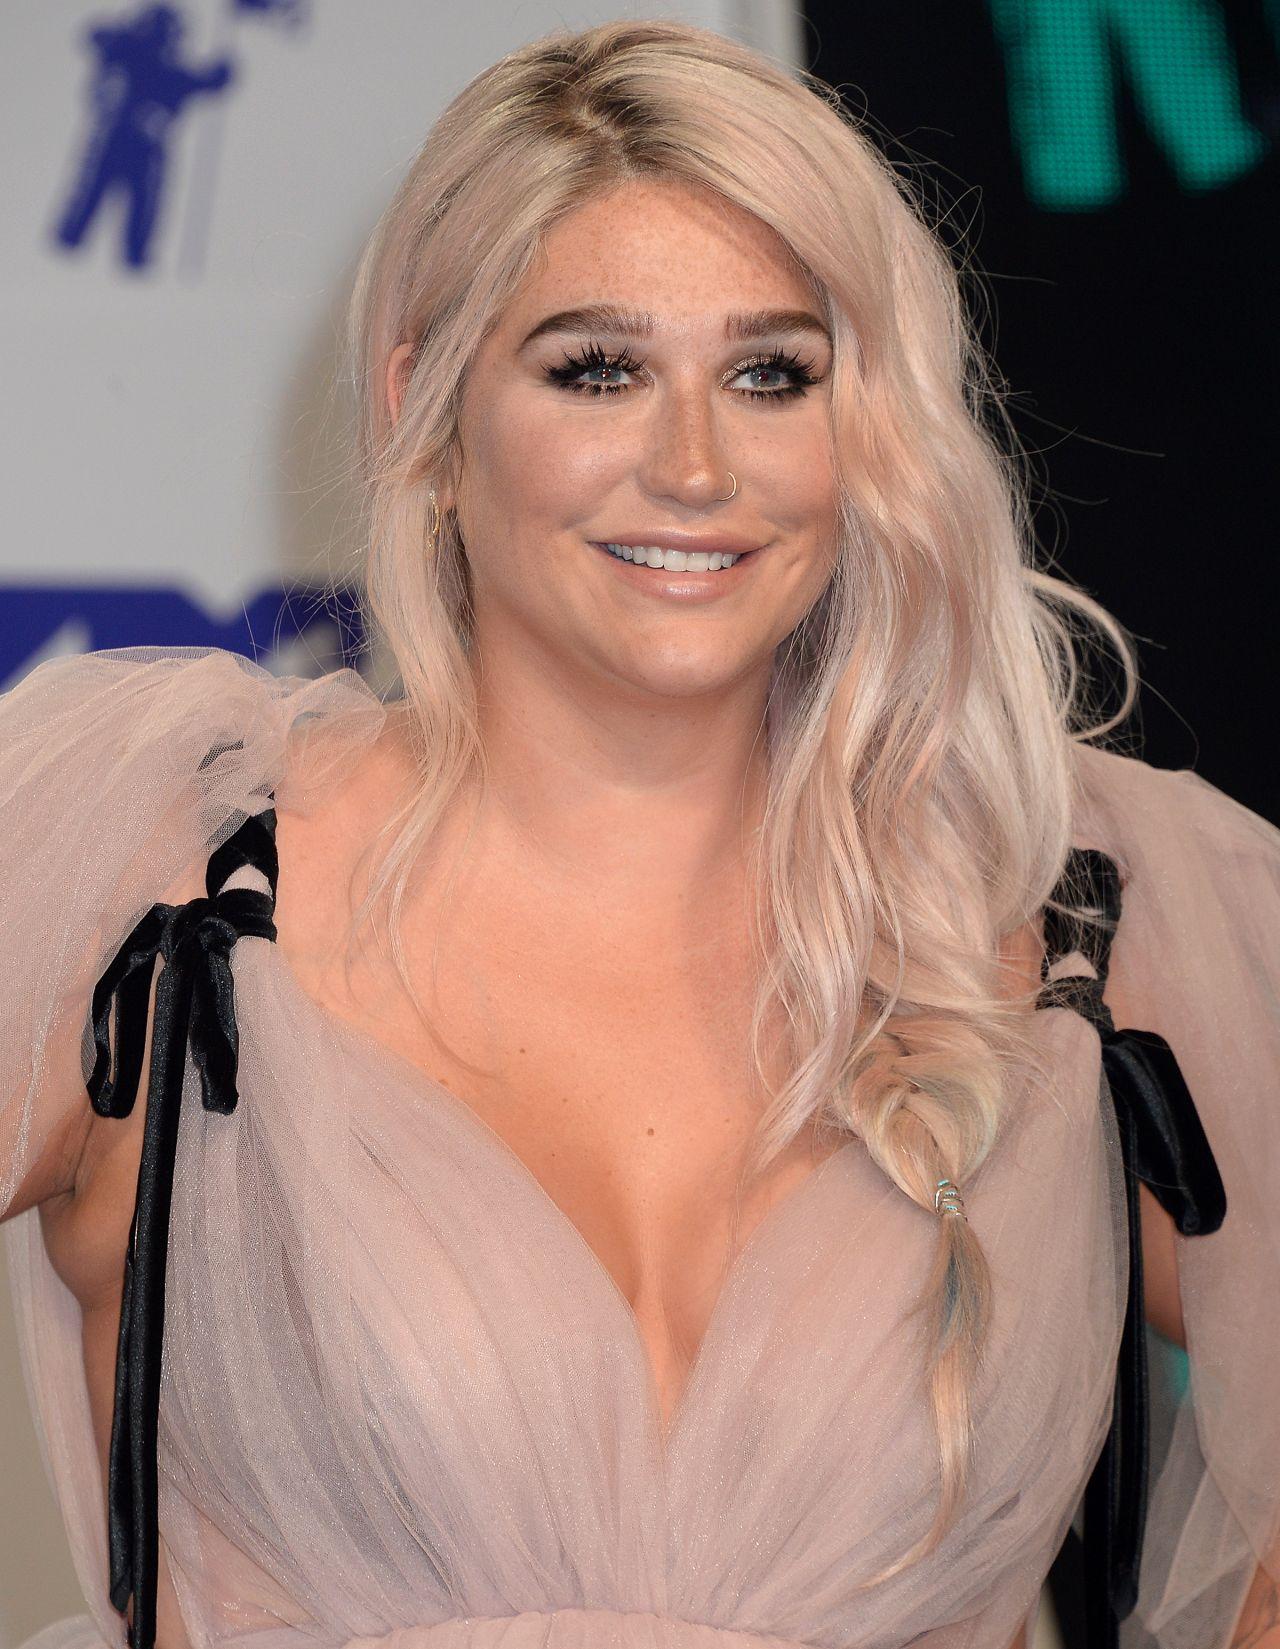 KESHA SEBERT at 2017 MTV Video Music Awards in Los Angeles